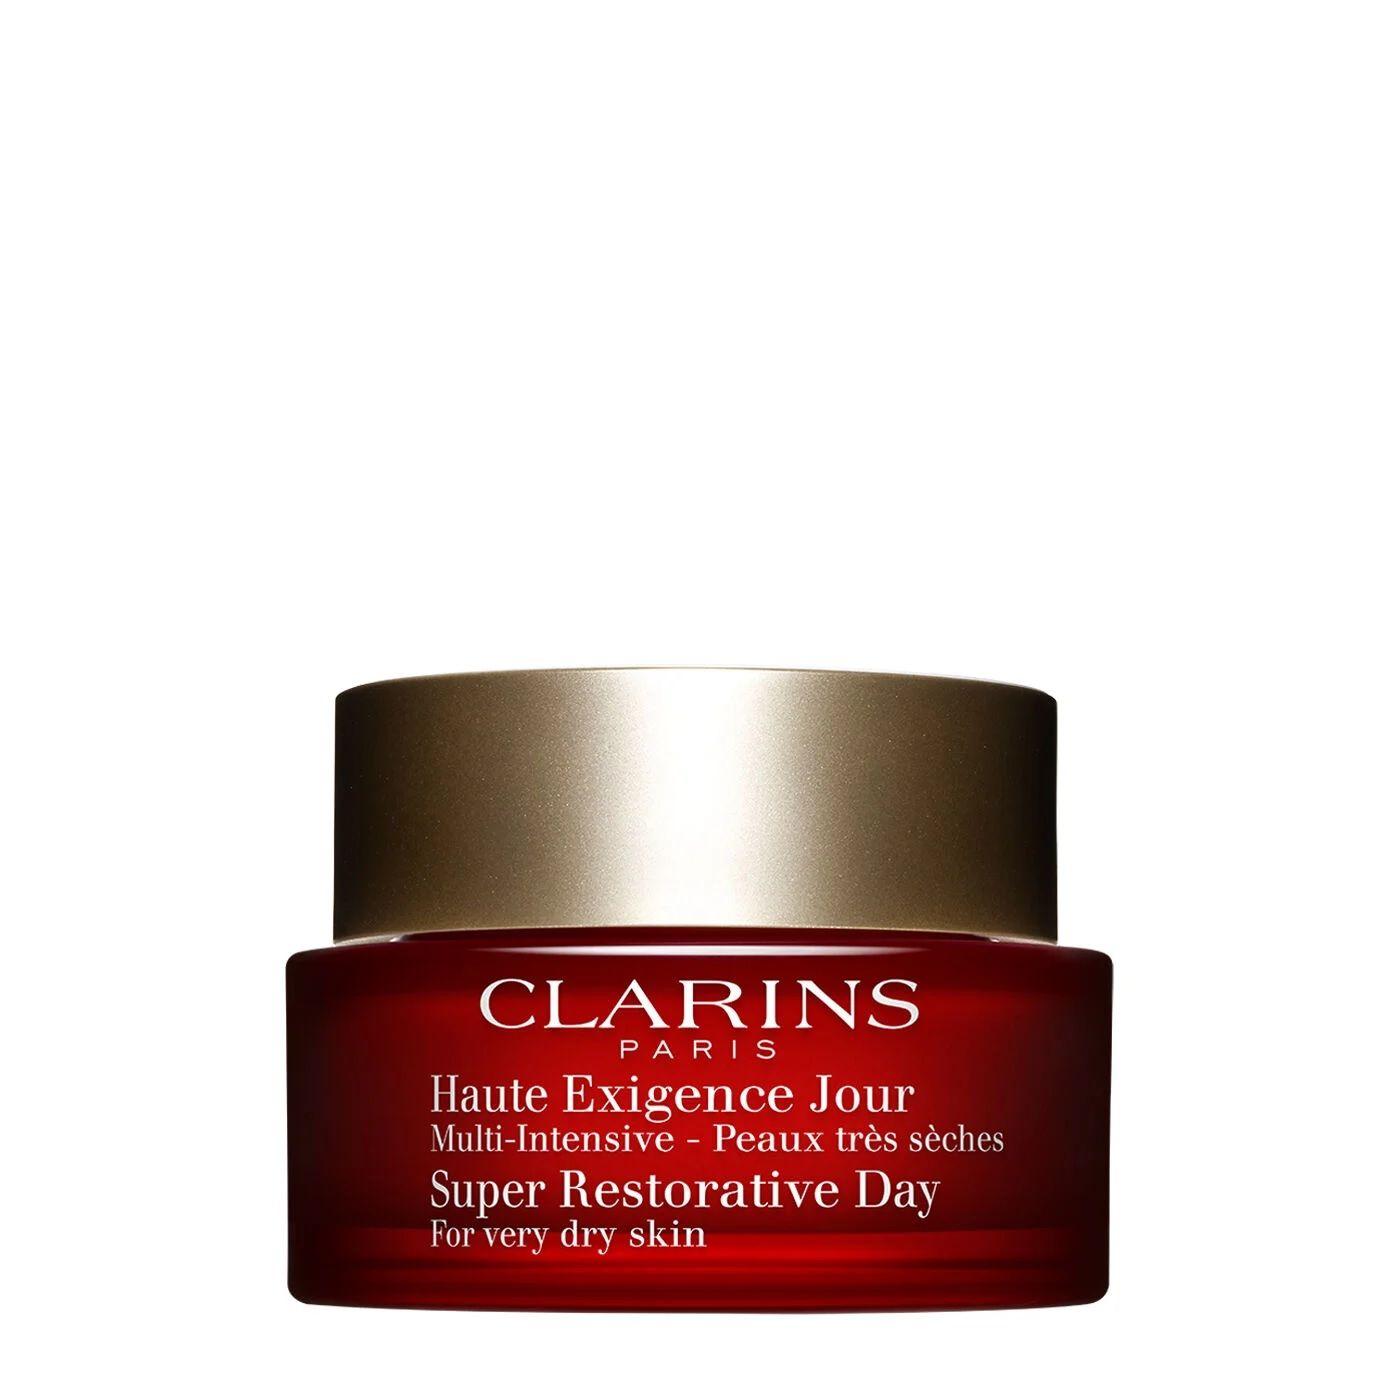 10 Boxycharm X Clarins Ideas Clarins Boxycharm Face Products Skincare